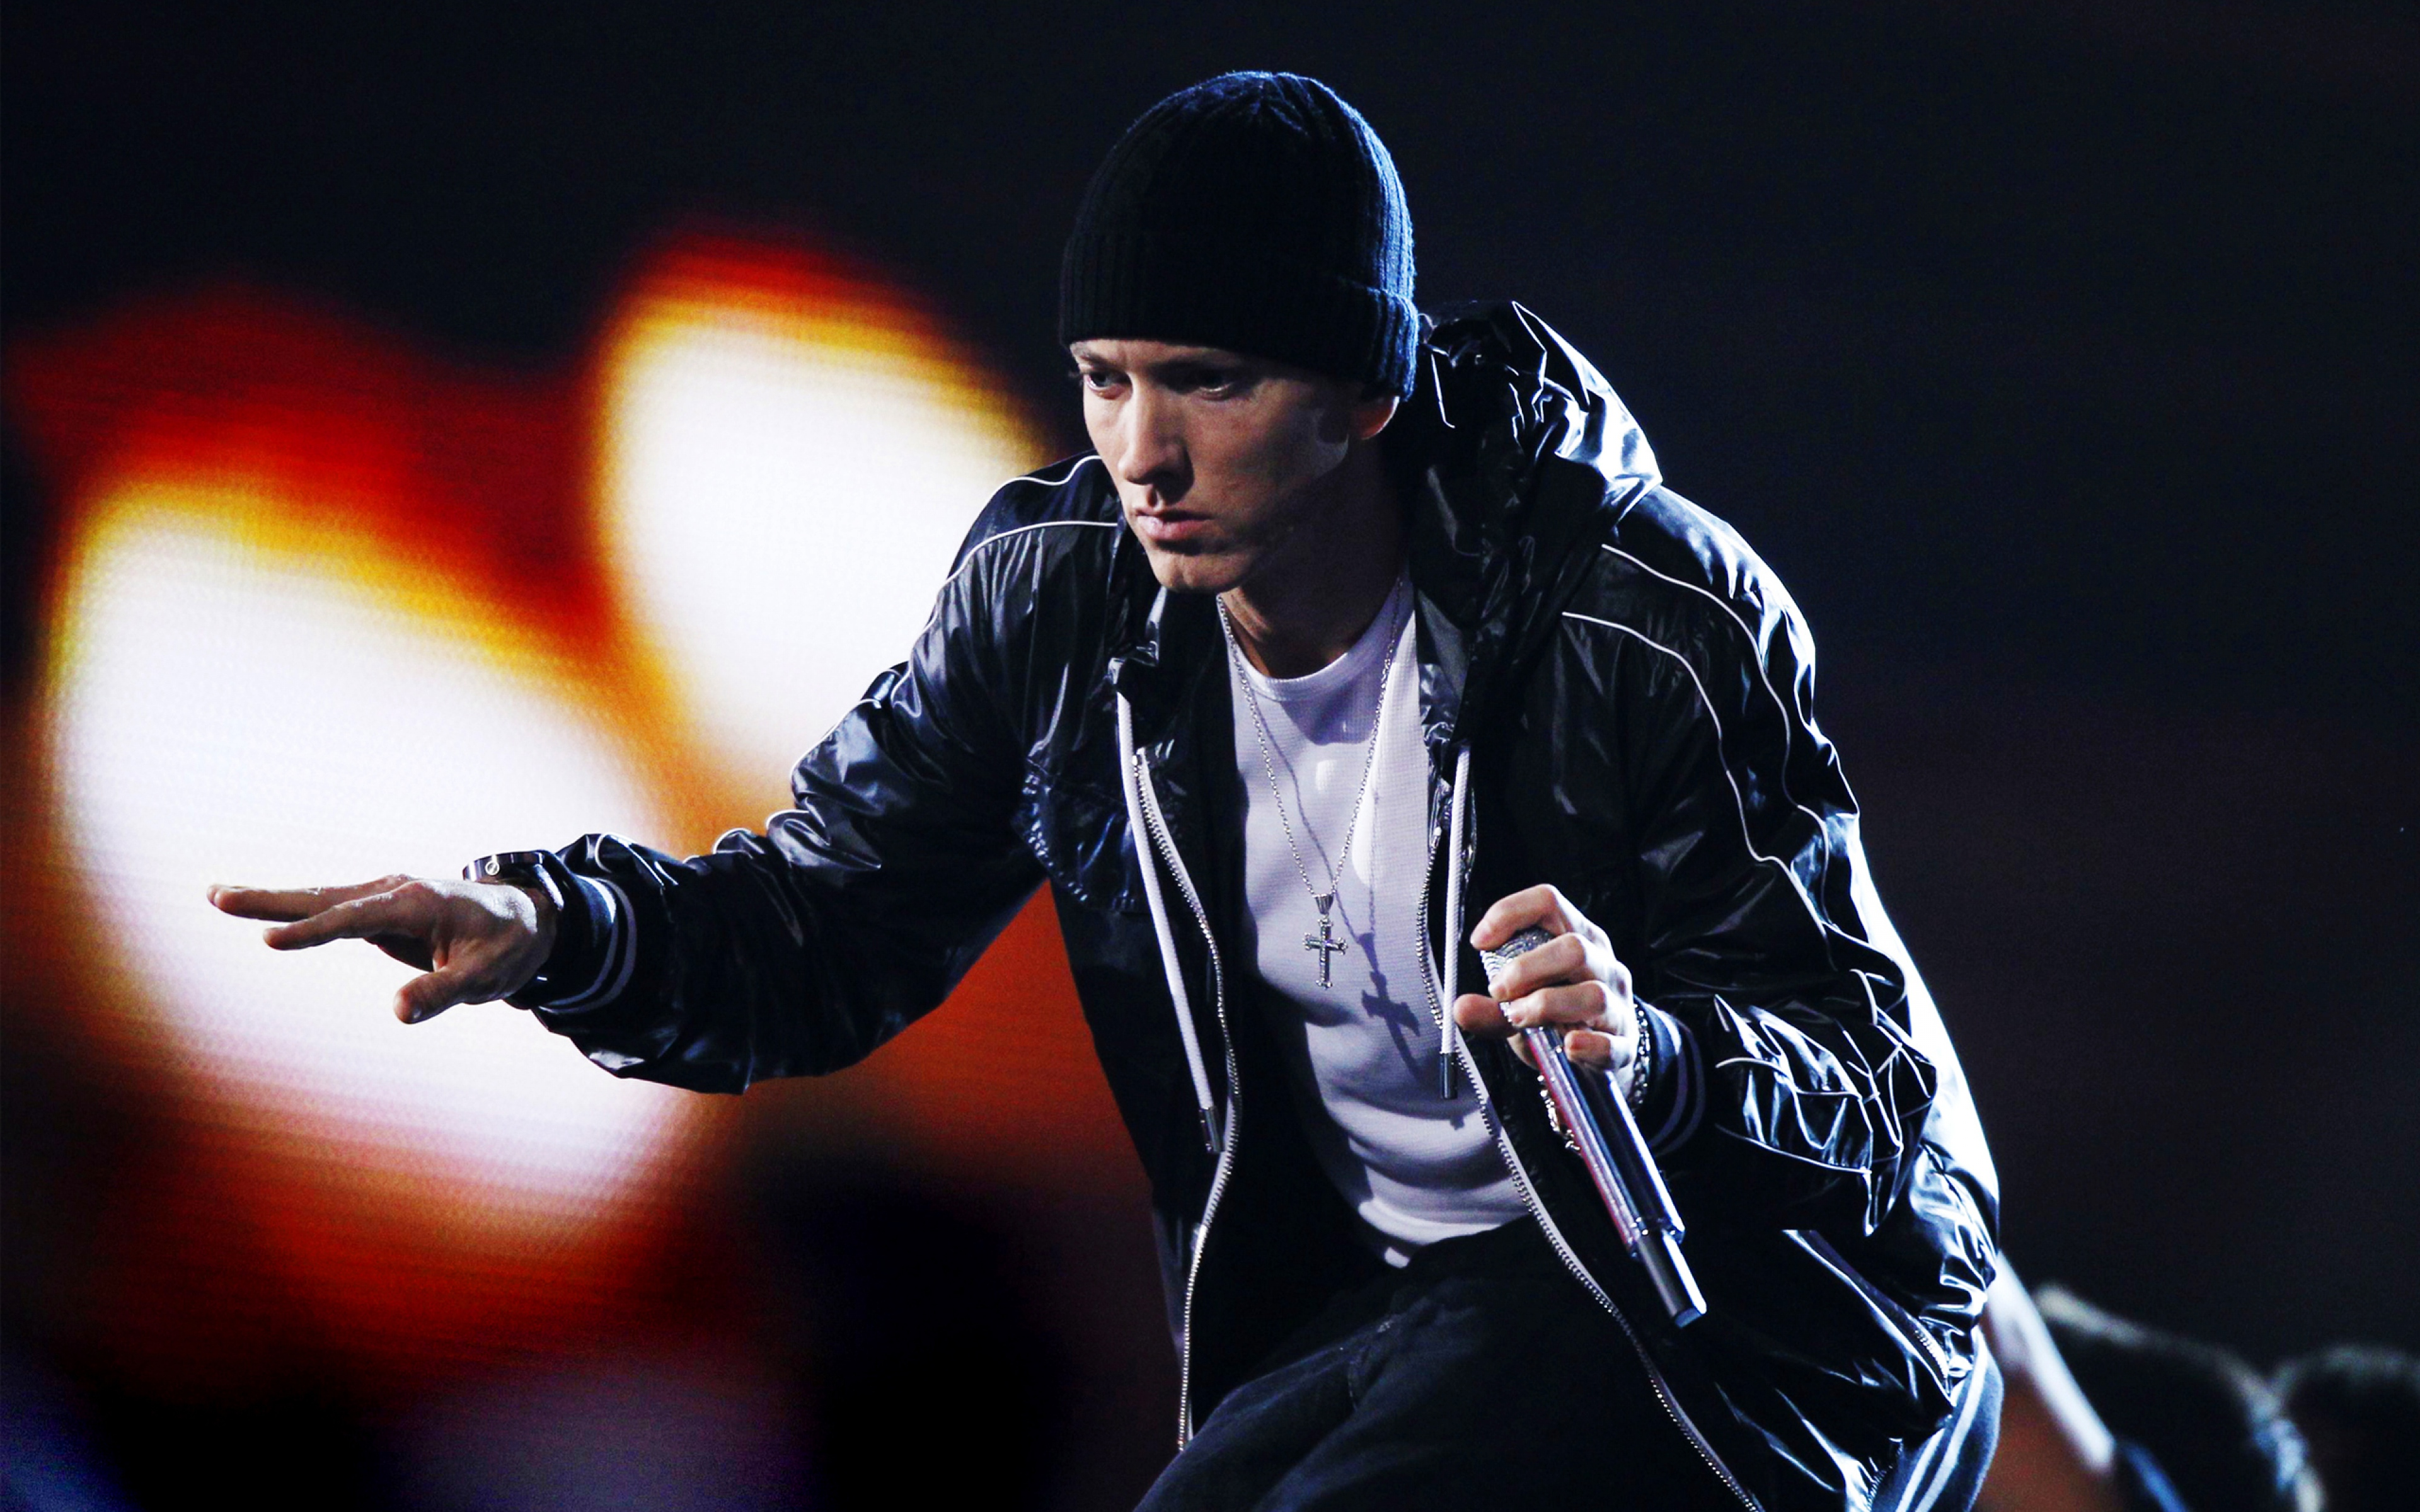 Fall Out Boy Iphone Wallpaper Eminem Wallpapers Hd Pixelstalk Net